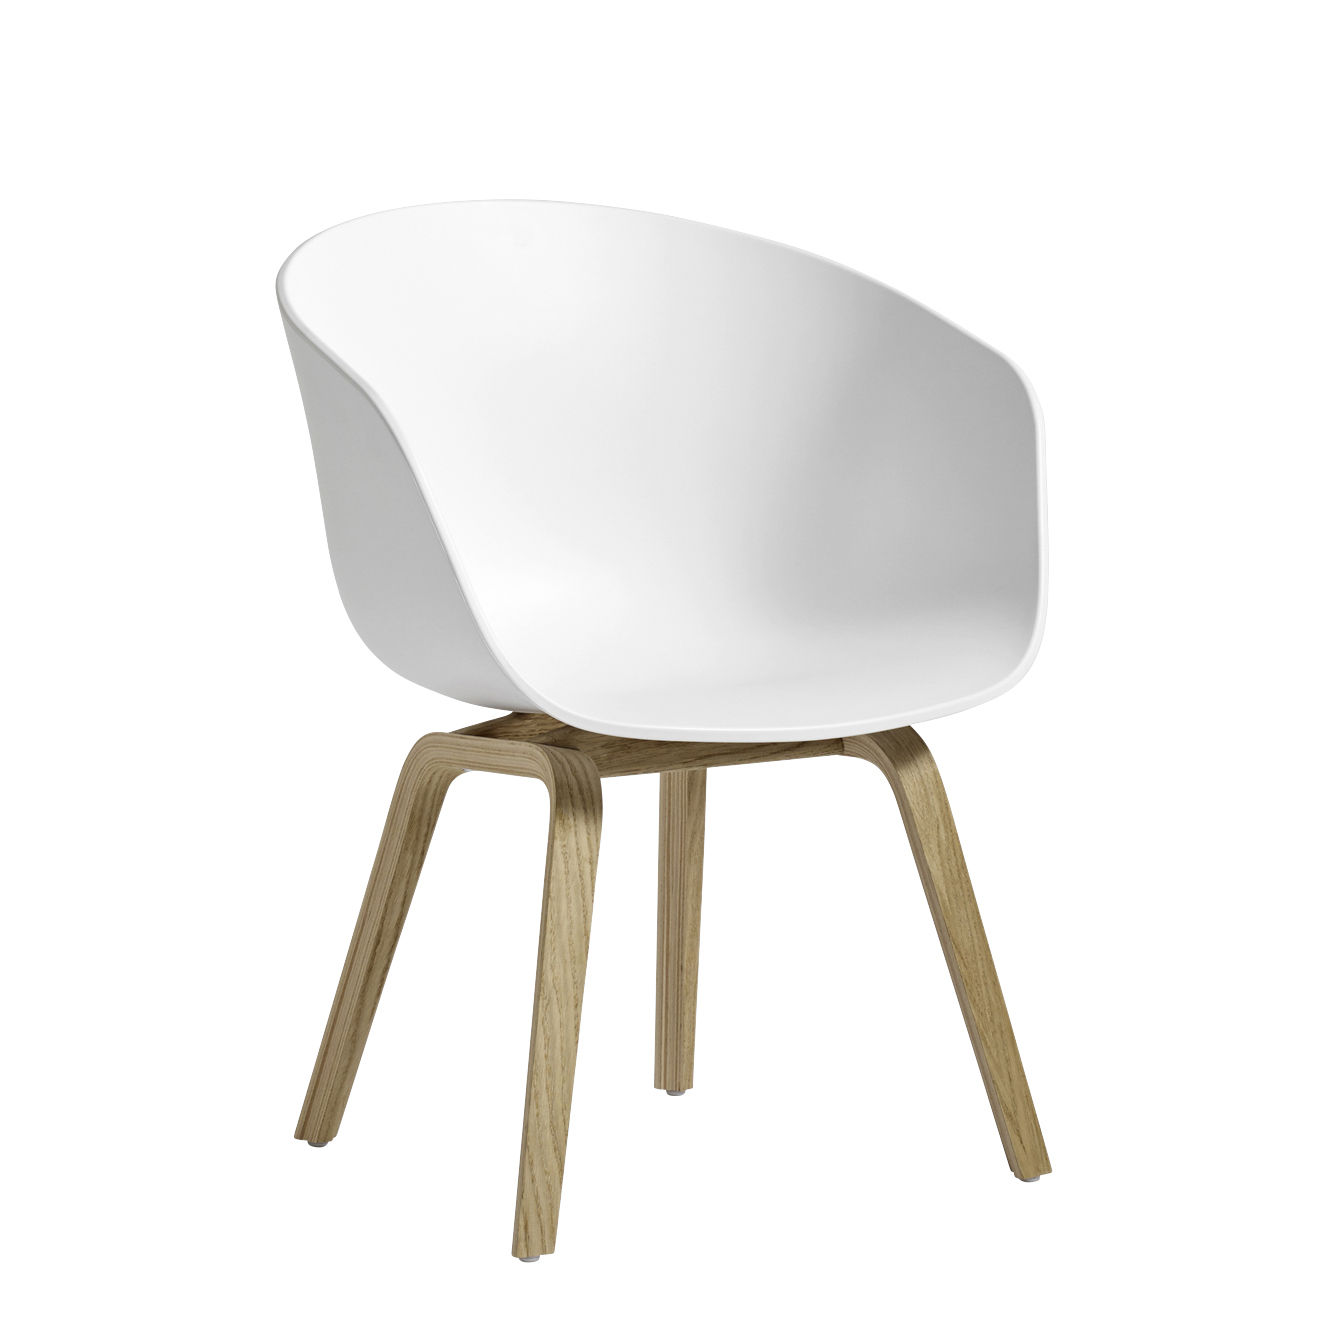 Furniture - Armchairs - About a chair AAC42 Low armchair - / Plastic & oak by Hay - White / Soaped oak - Oak, Polypropylene